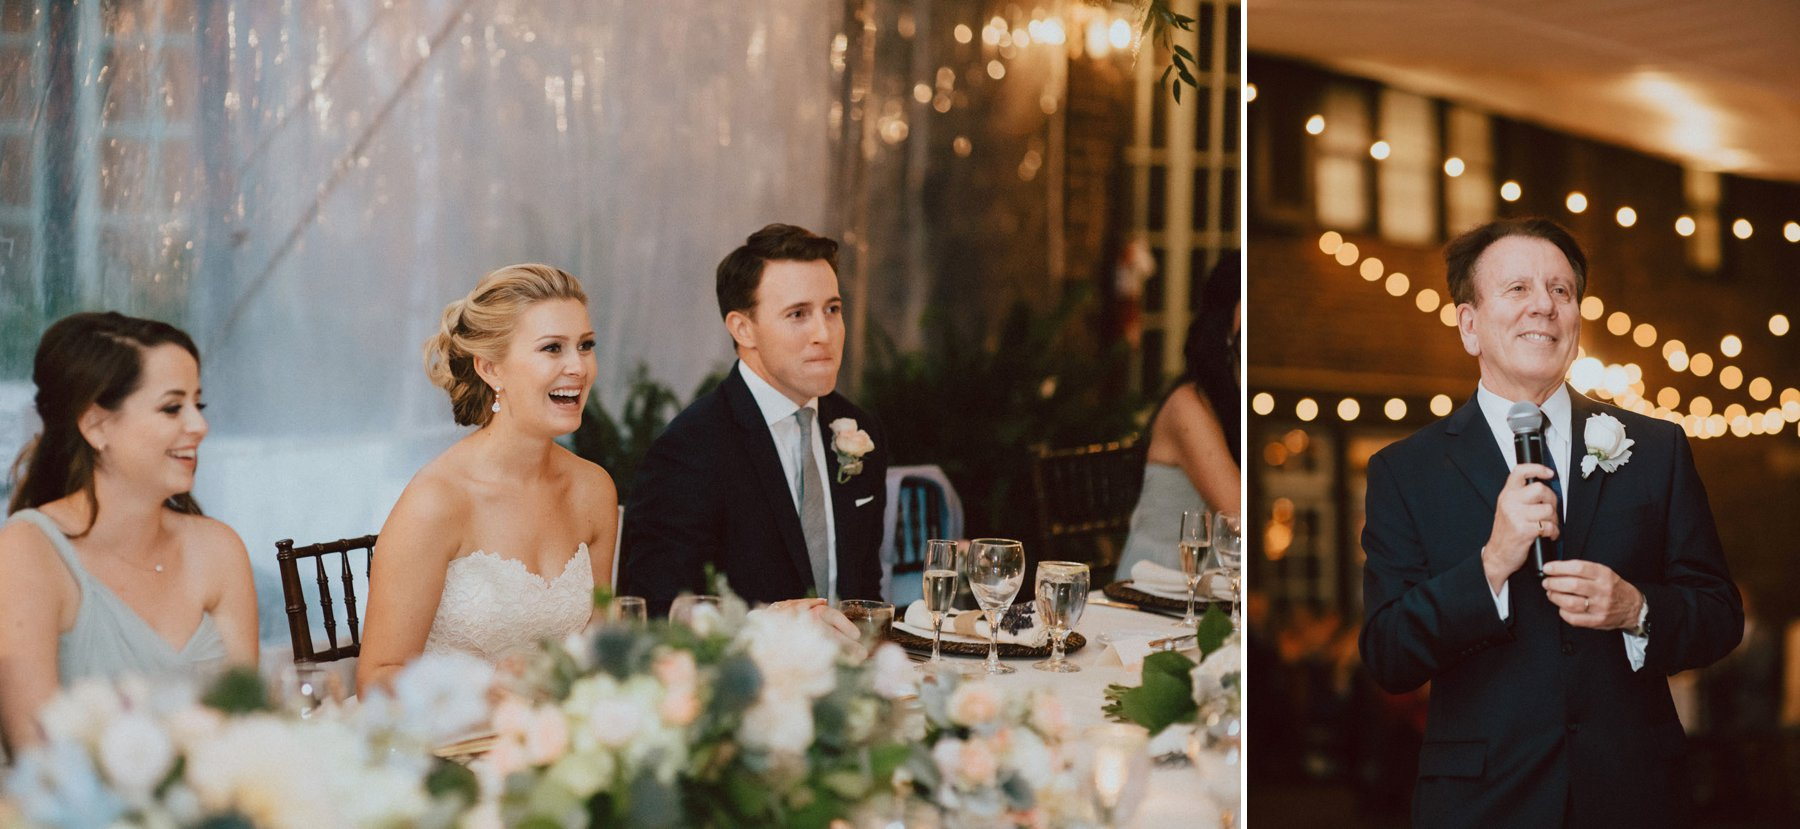 greenville-country-club-wedding-134.jpg